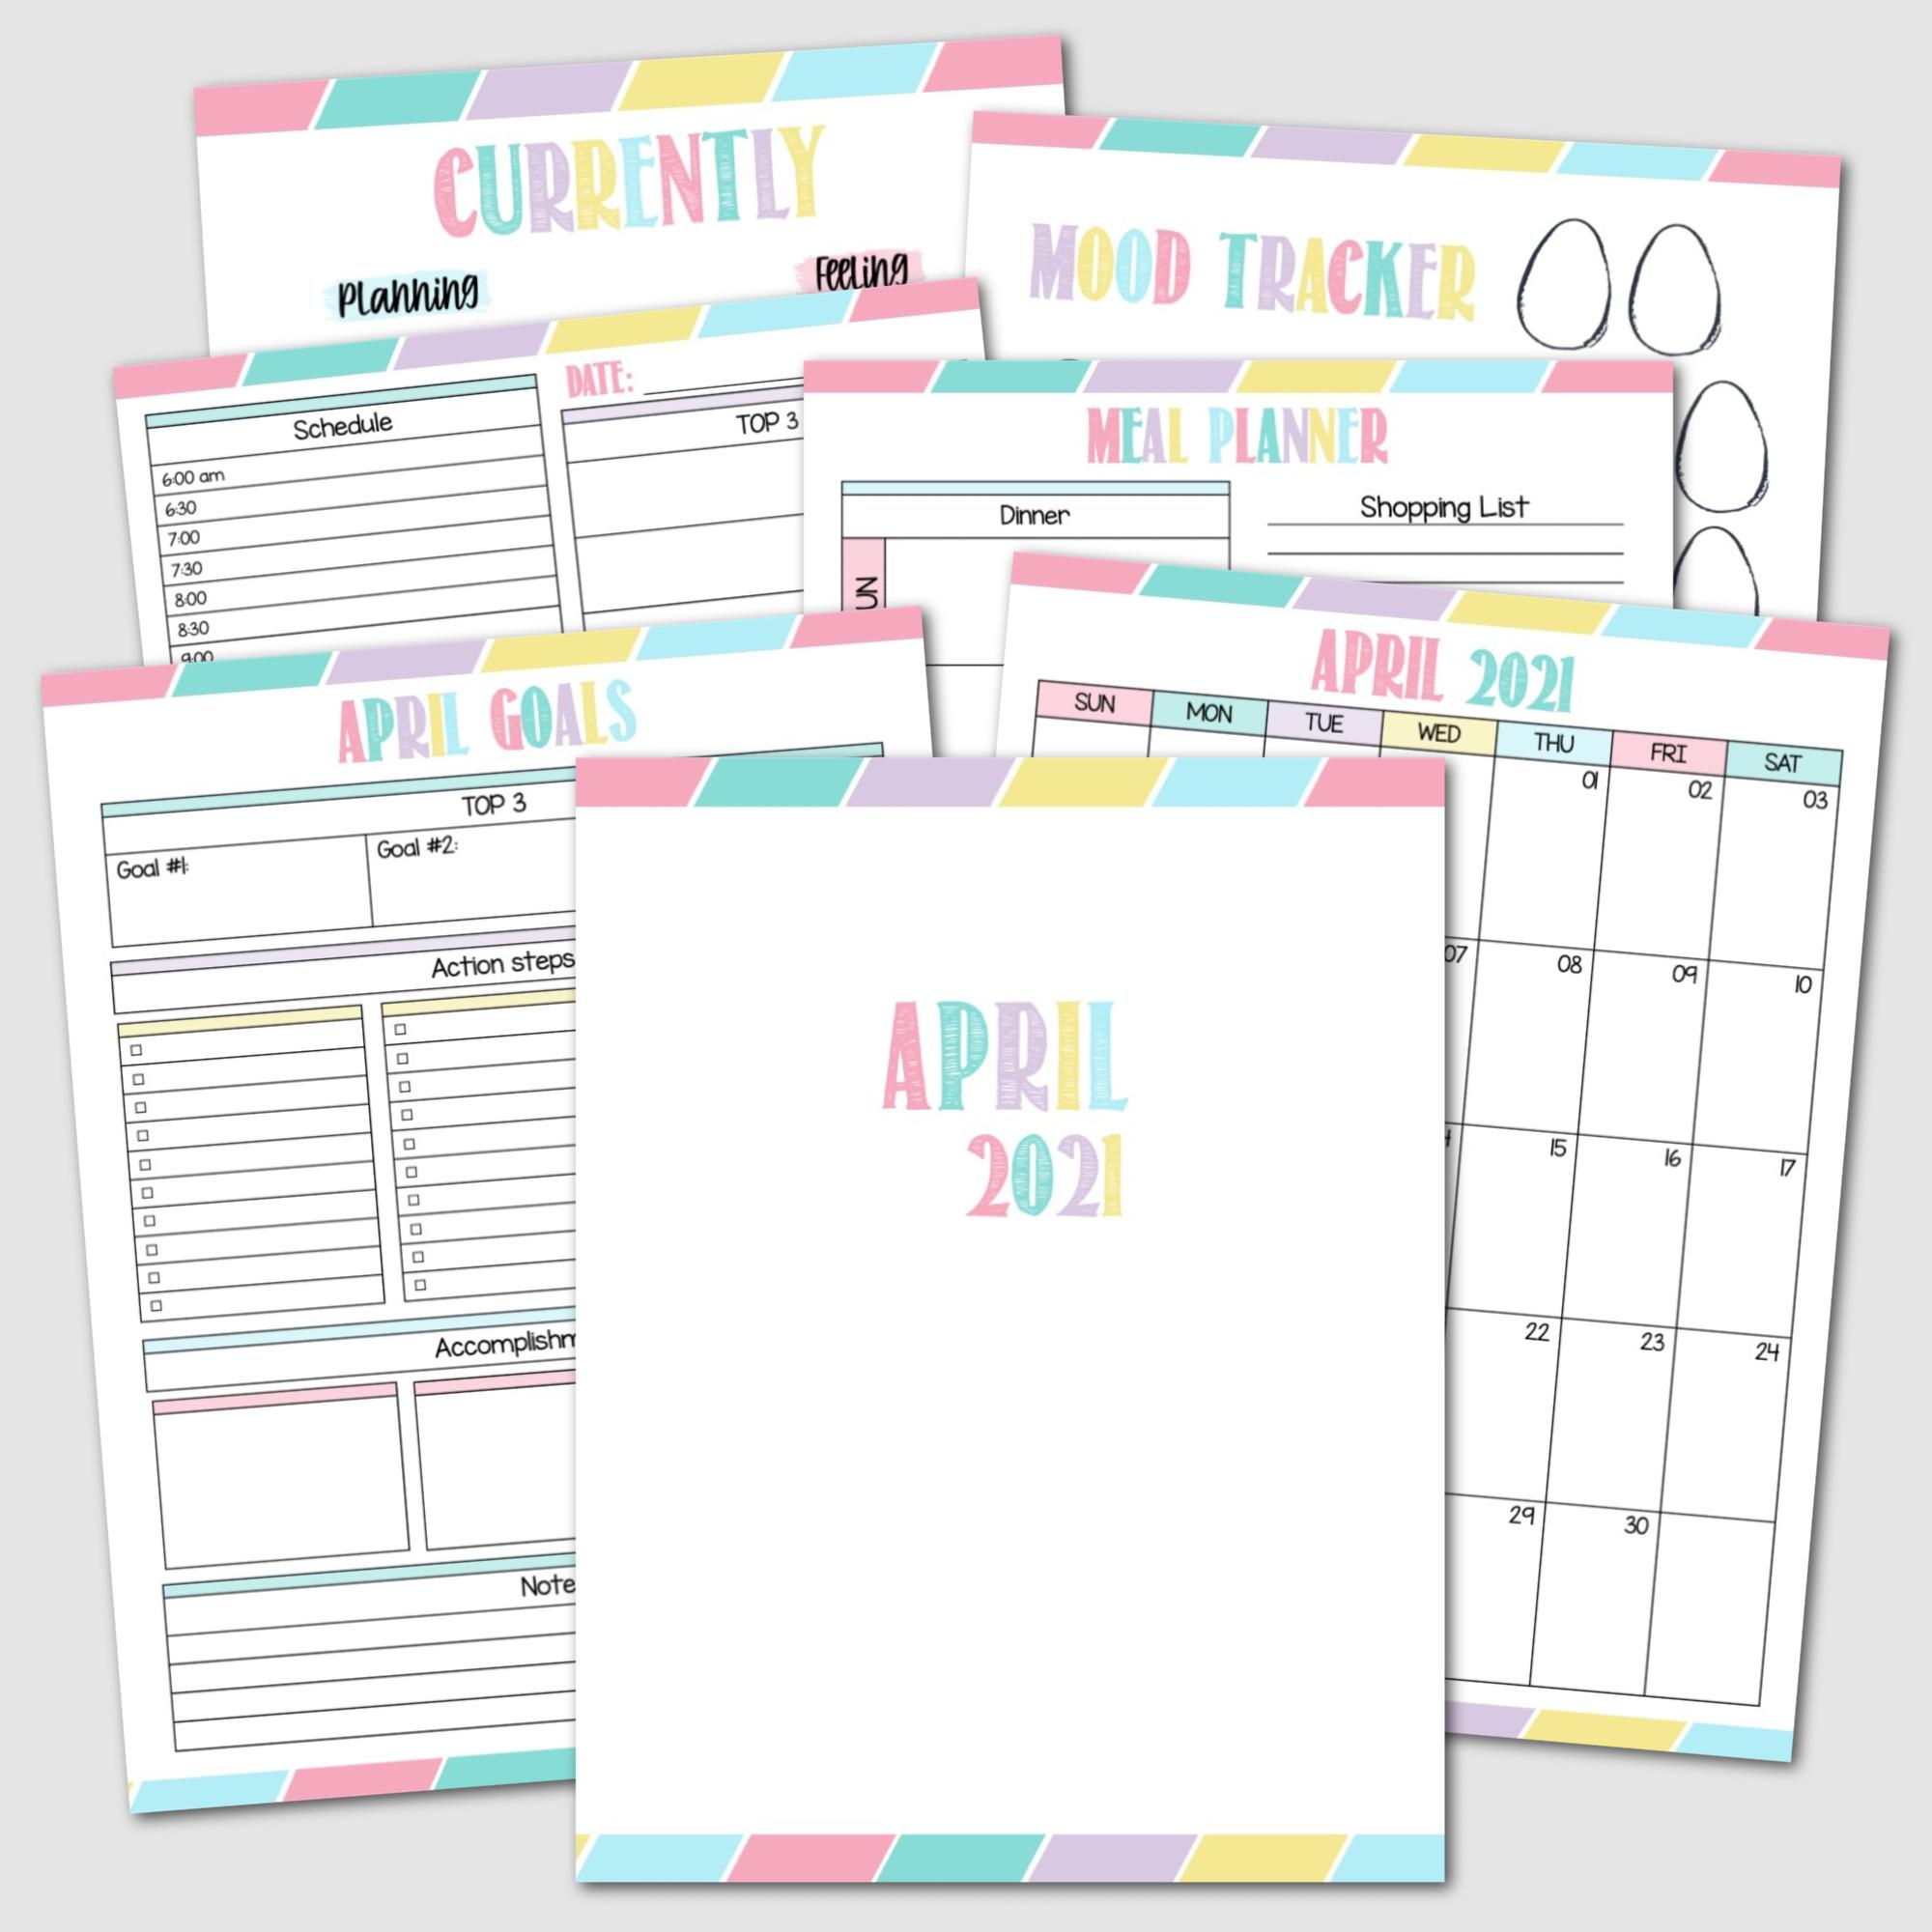 April Krafty Planner Society  Rainbow Edition.png